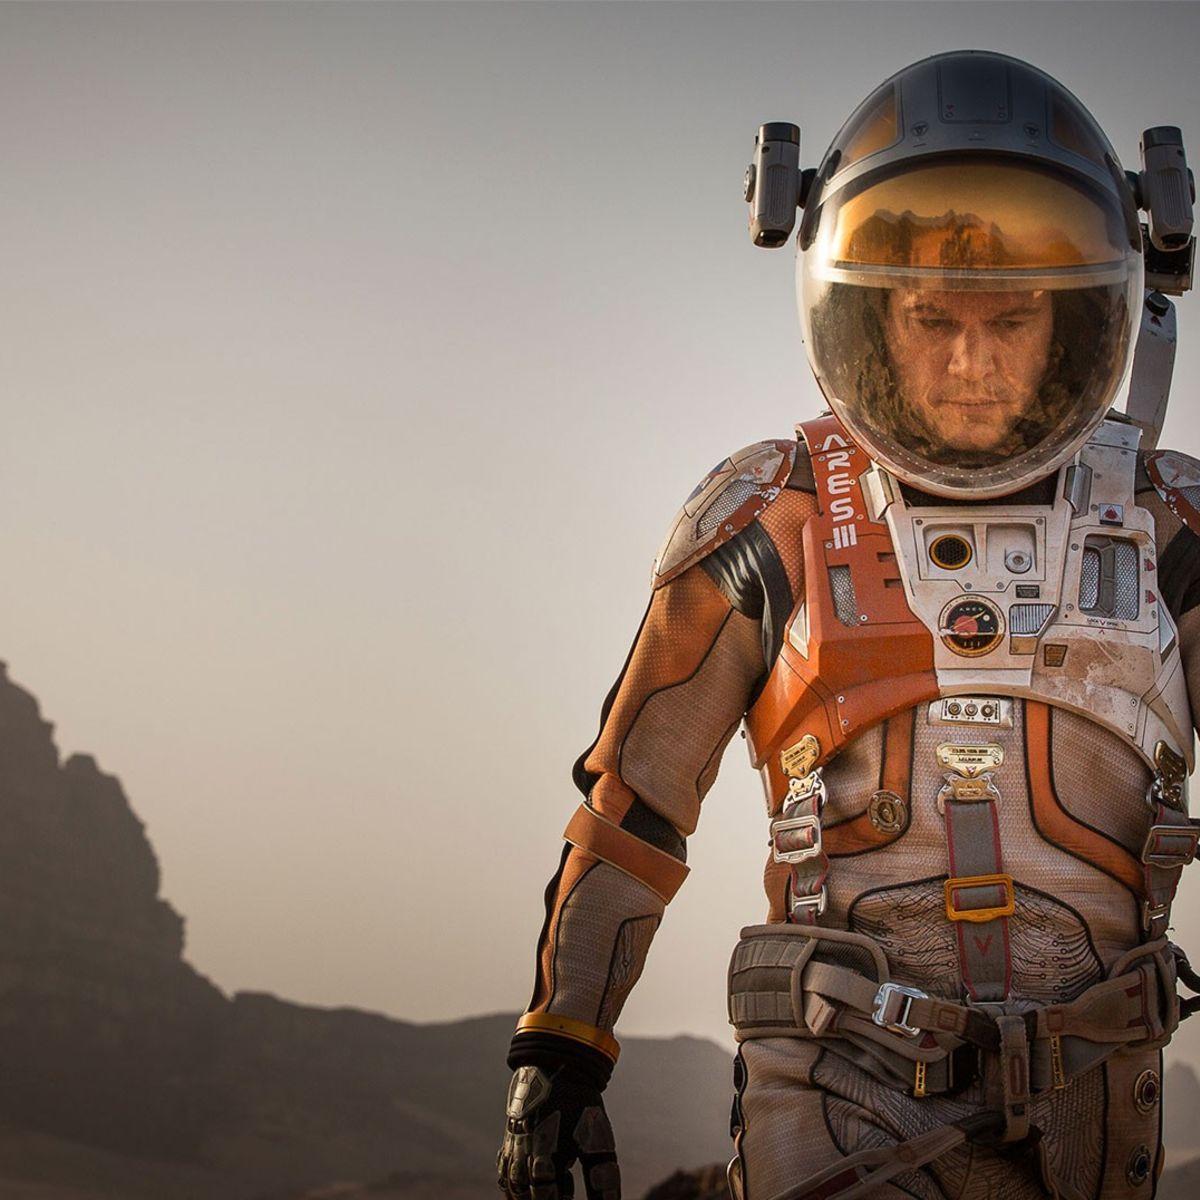 Matt Damon survives on Mars in The Martian